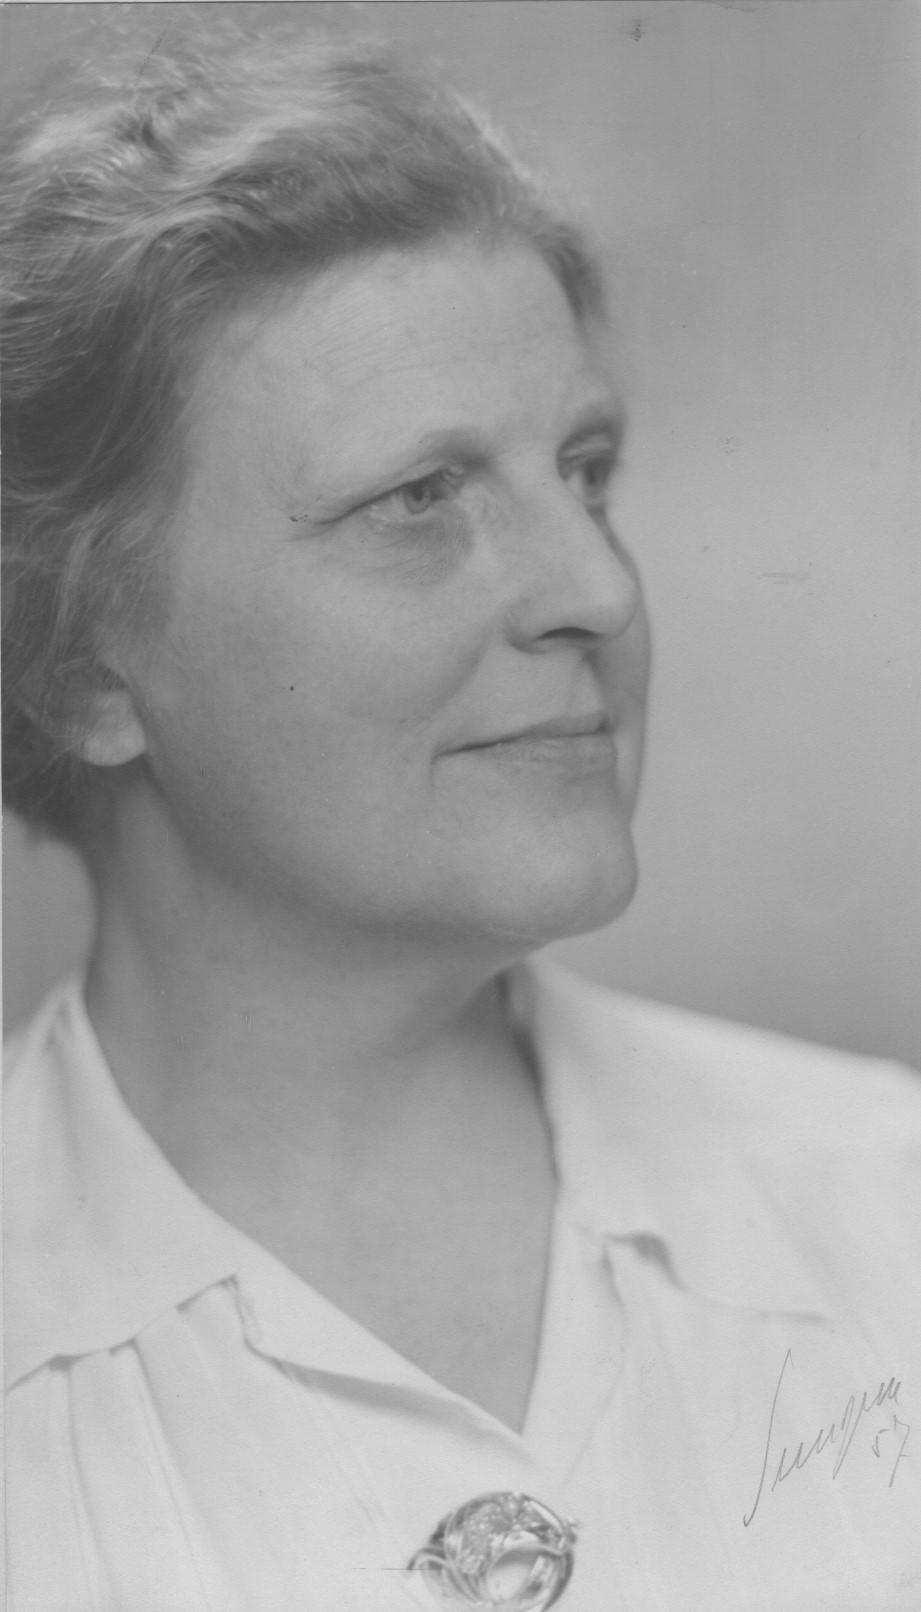 Anna Bohlin, family photo by Gunnar Sundgren (cropped)